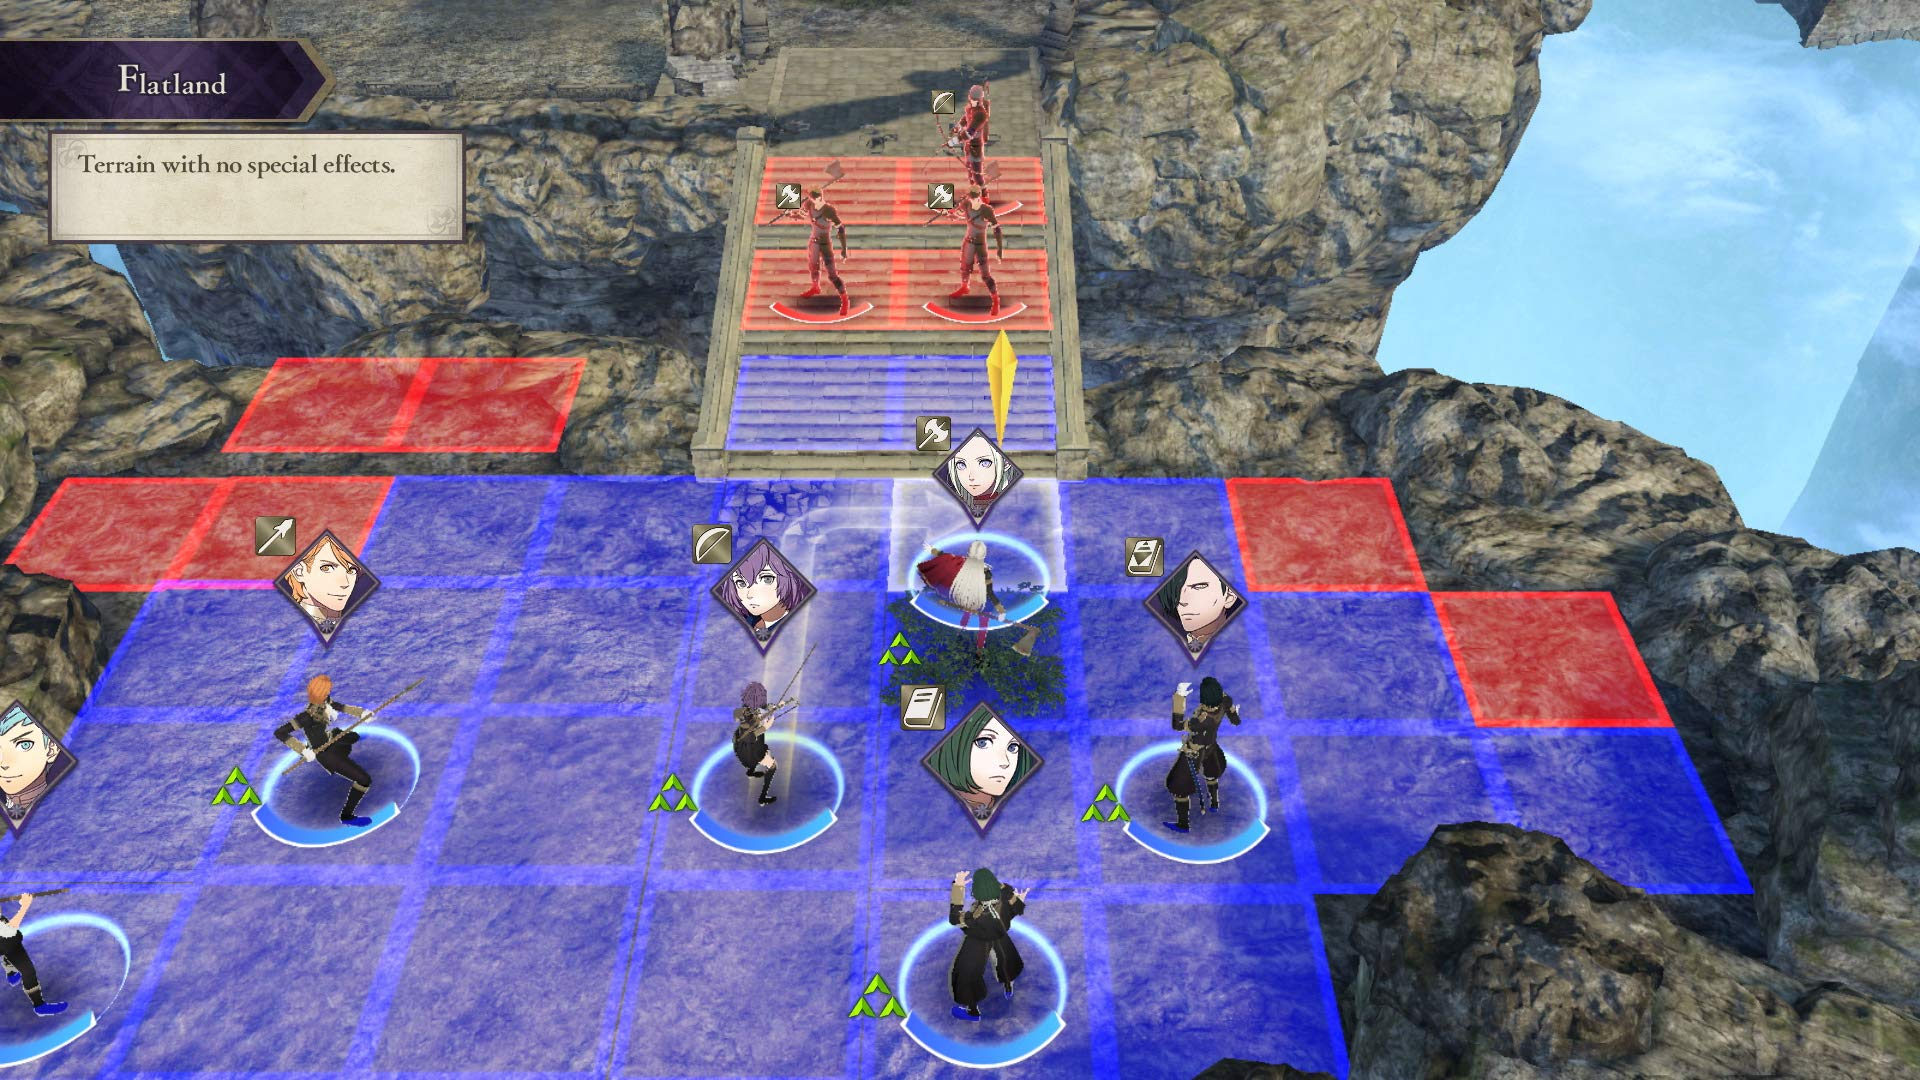 Fire Emblem: Three Houses by Nintendo (Image #2)